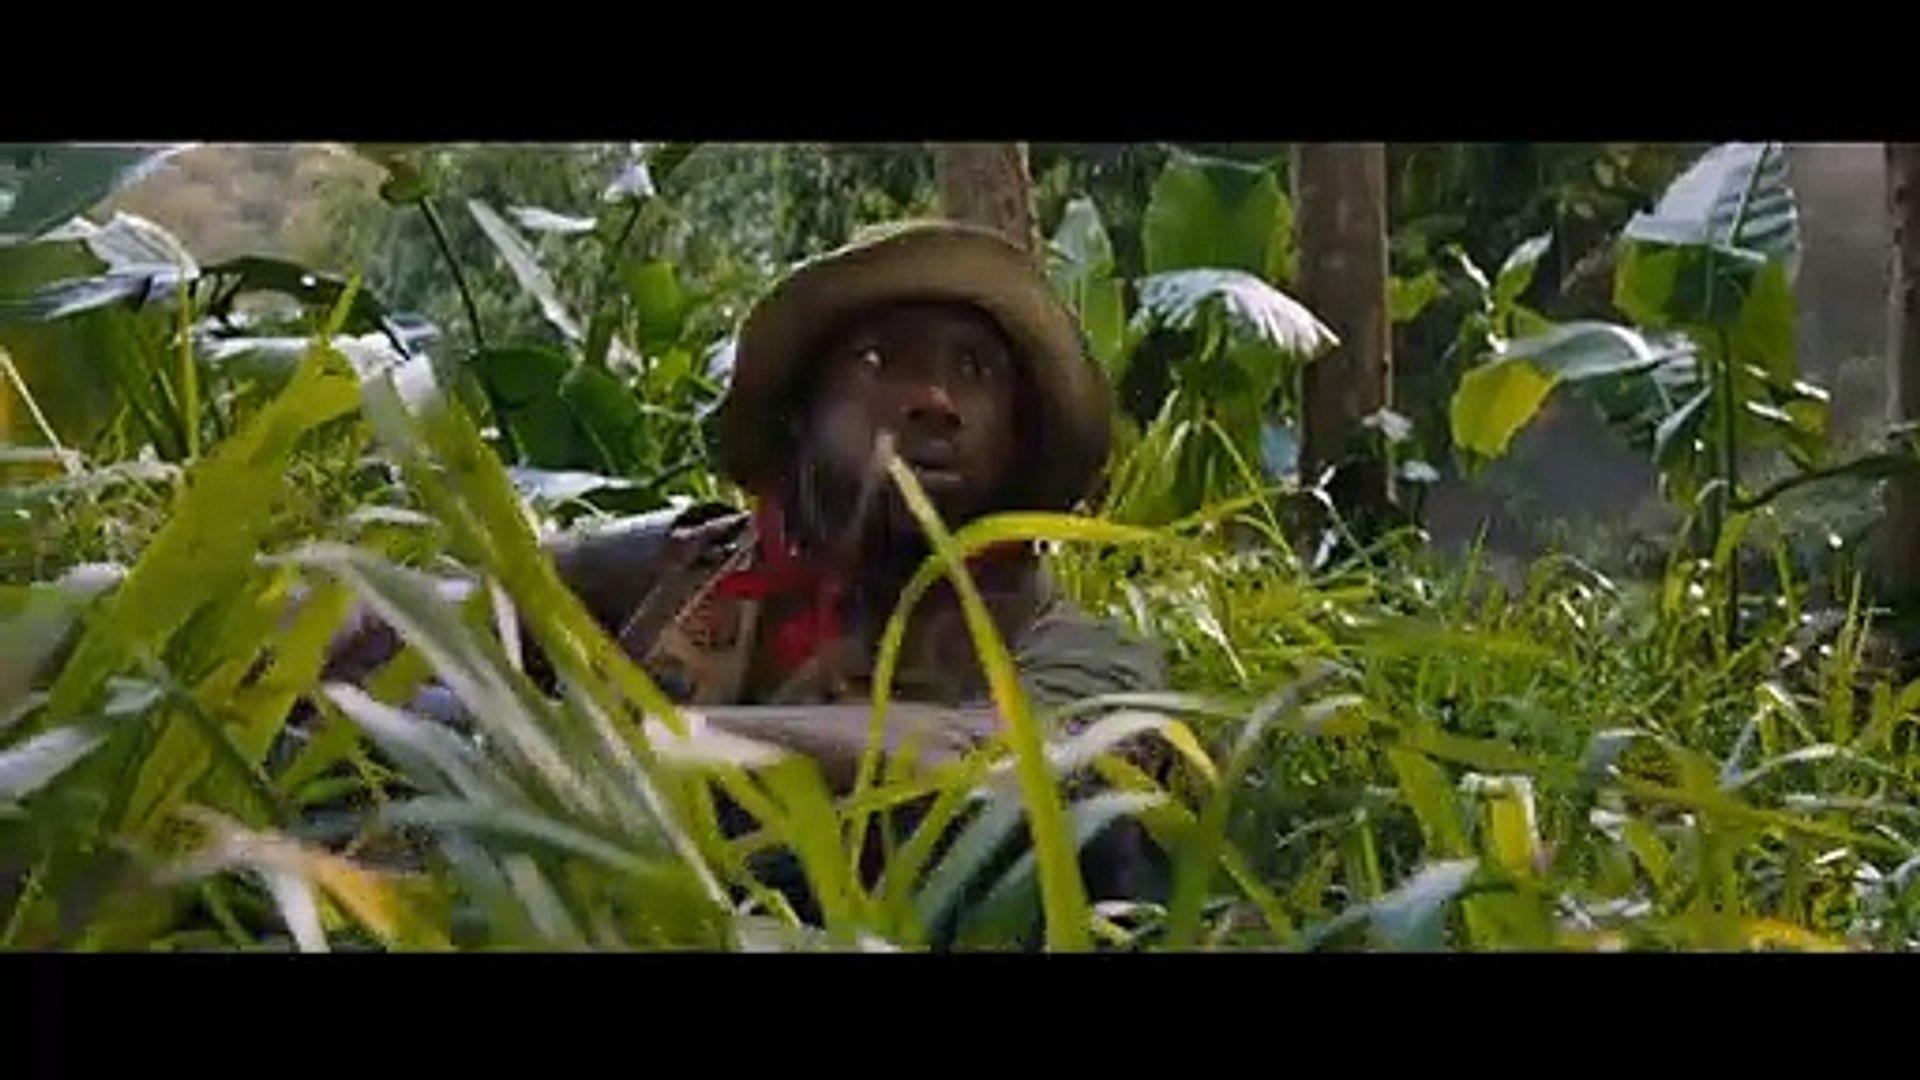 New trailer Movie JUMANJI- THE NEXT LEVEL - Official Trailer (HD) 2019